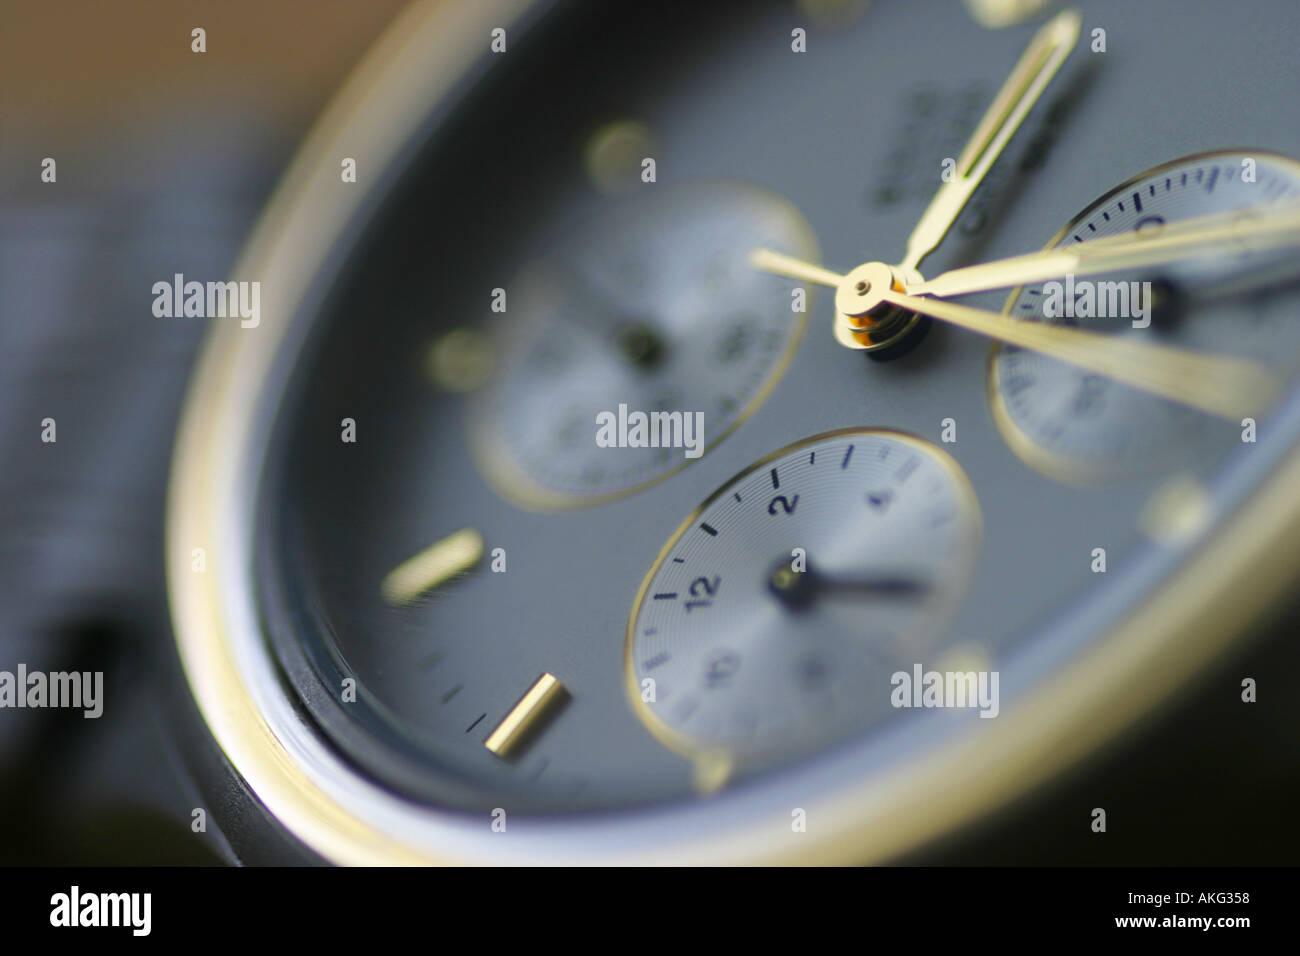 watch alarm chroniker chronograph chronometer - Stock Image